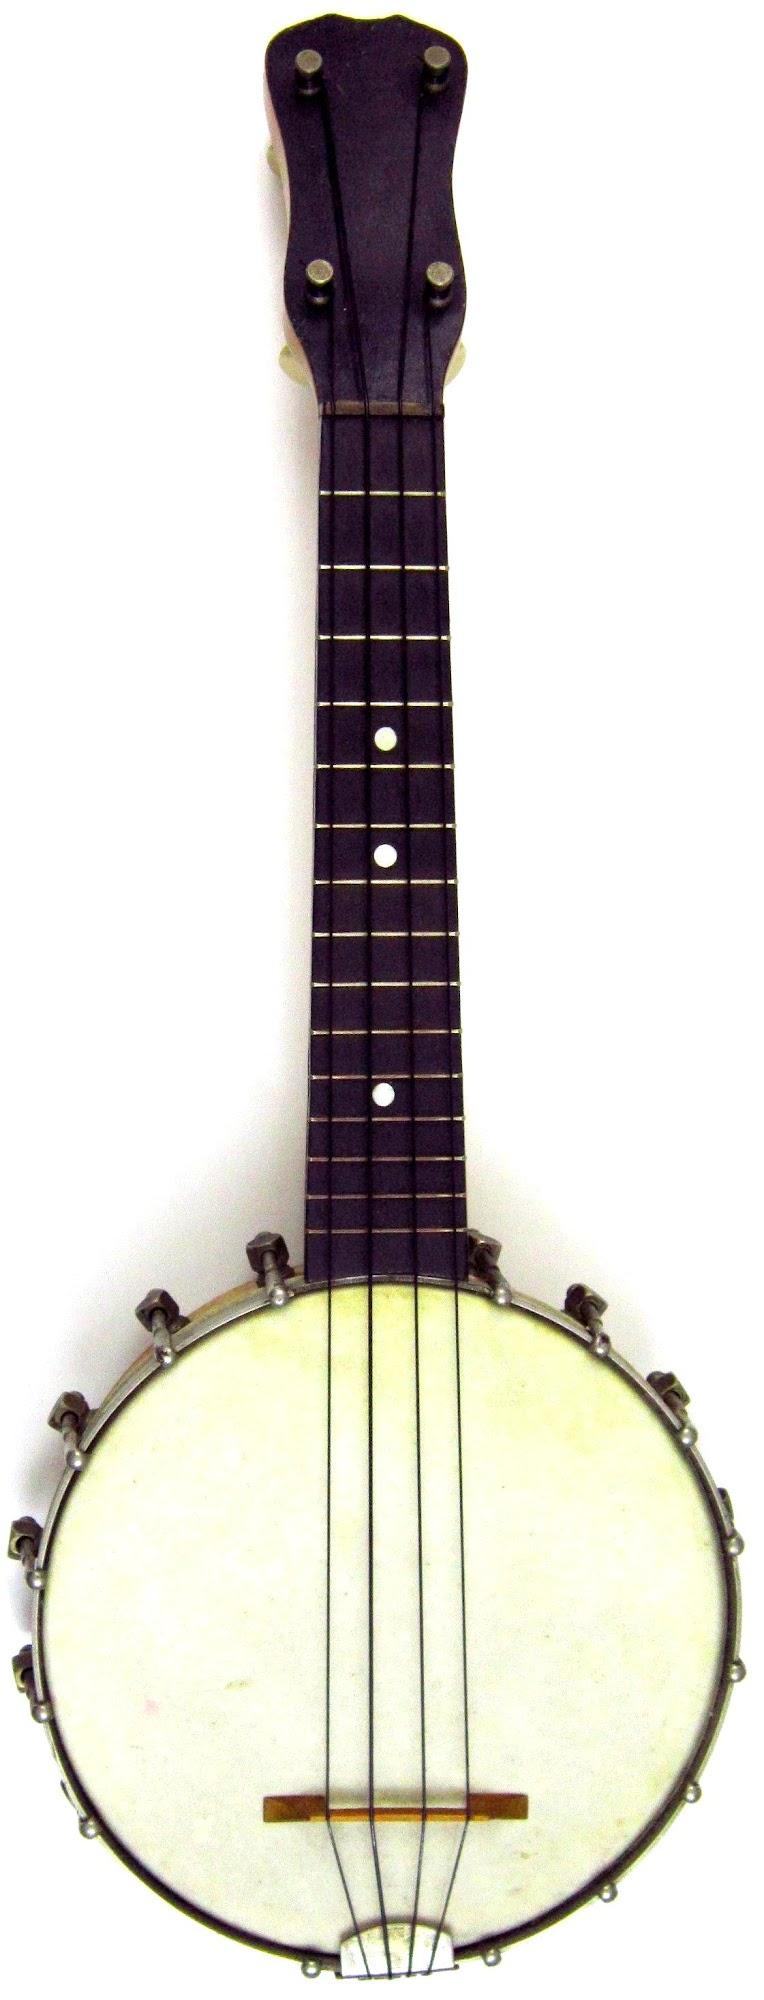 Concertone Tenor Banjo Used For Sale At Wiring Diagram Download